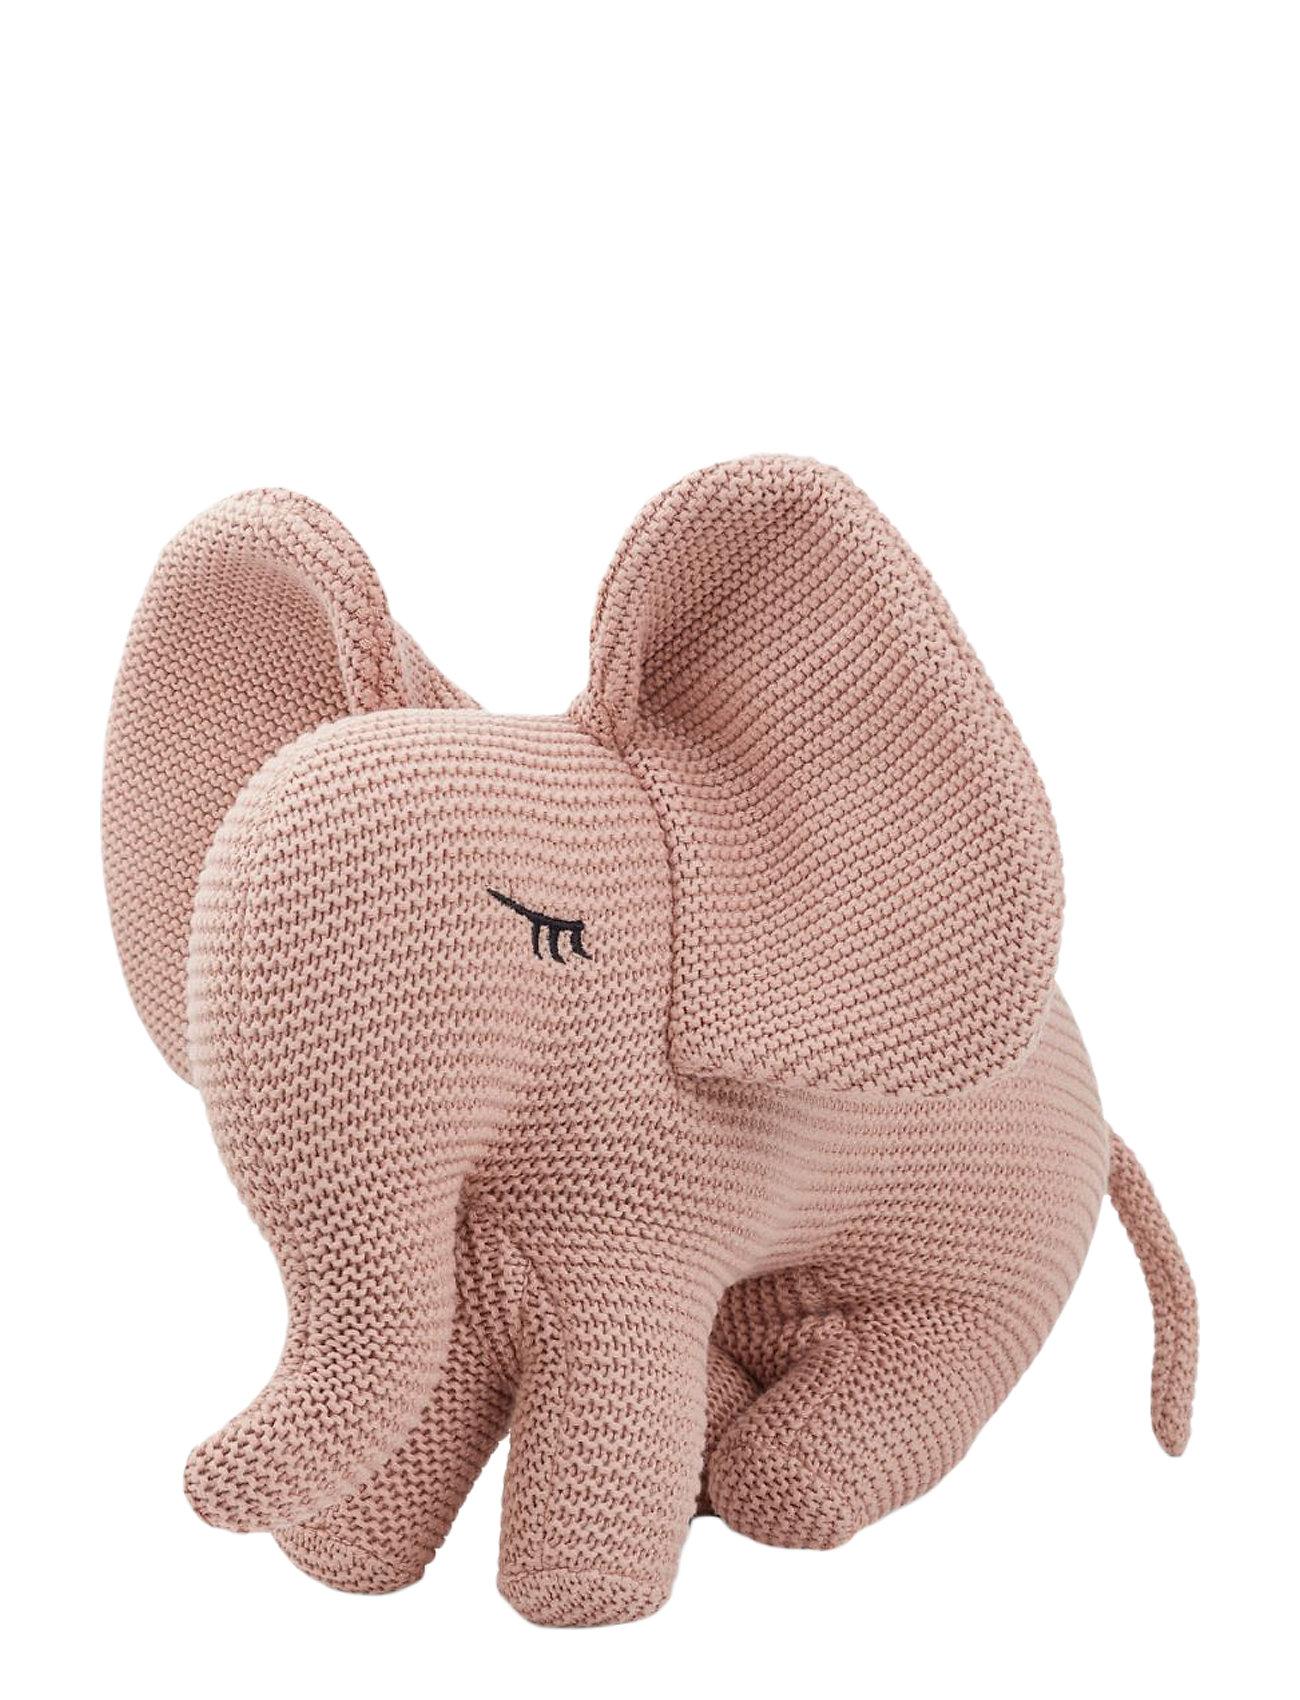 Liewood Dextor knit teddy - ELEPHANT ROSE